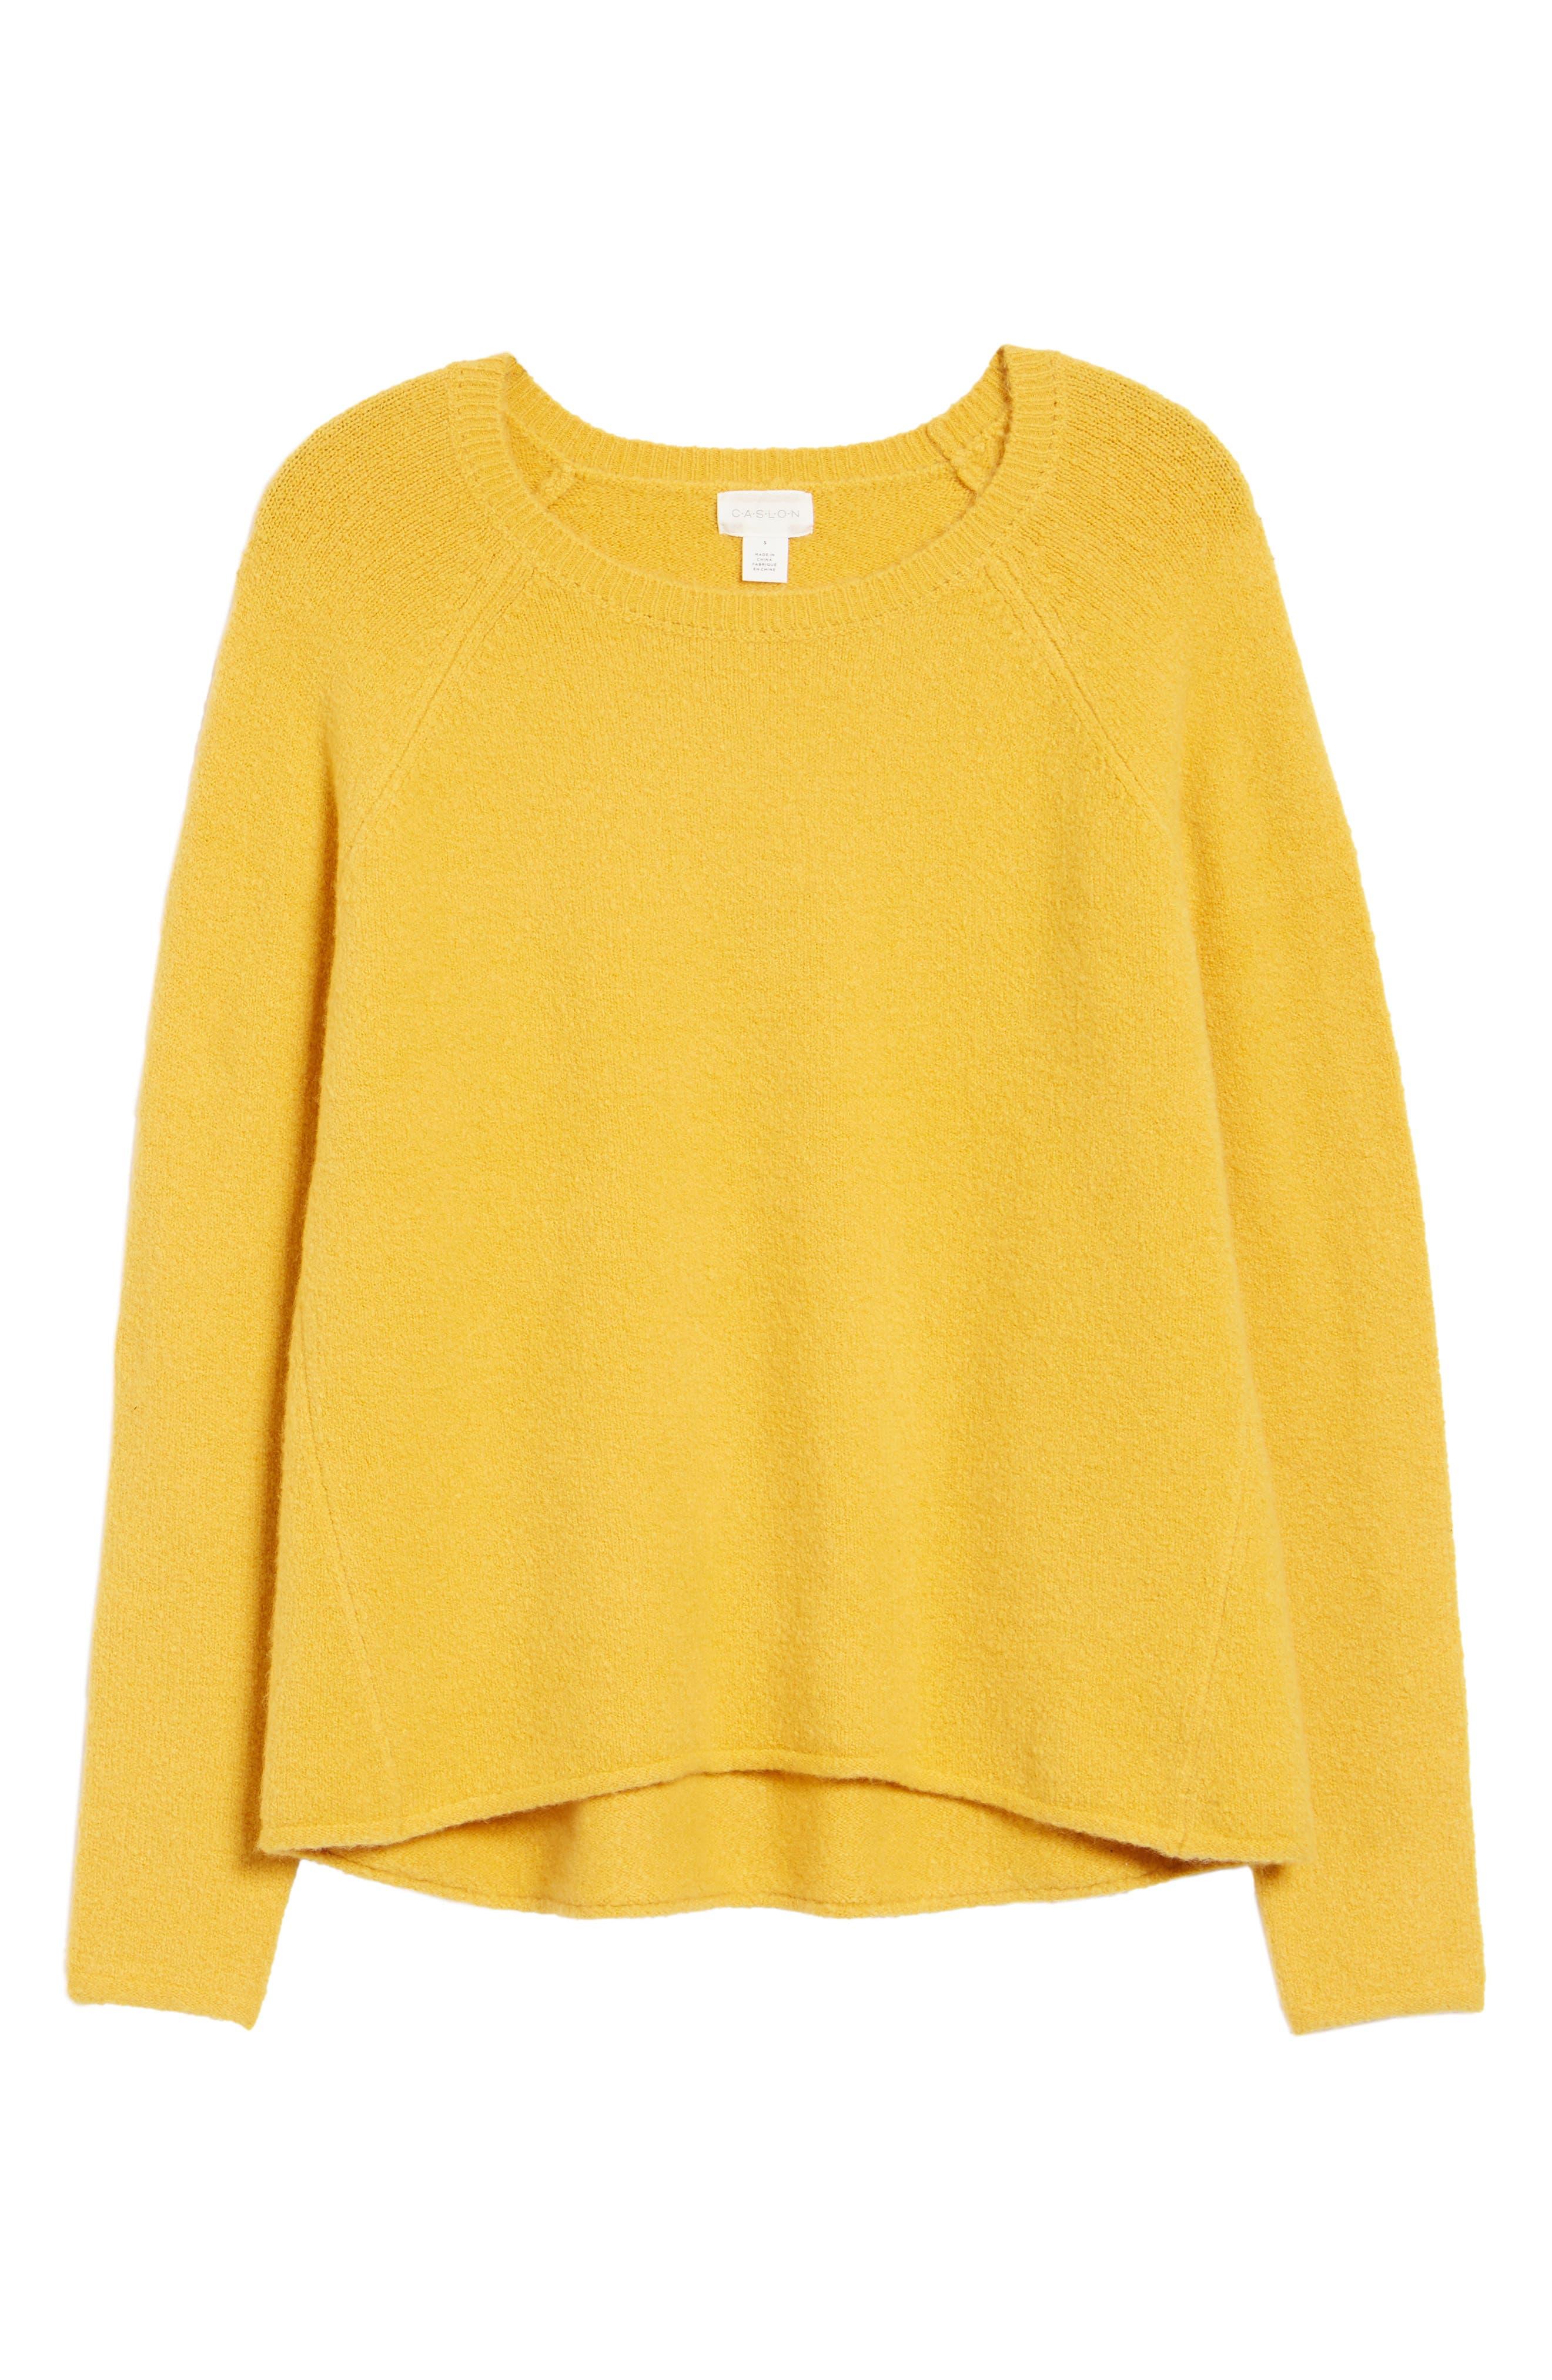 Women's Yellow Clothing | Nordstrom